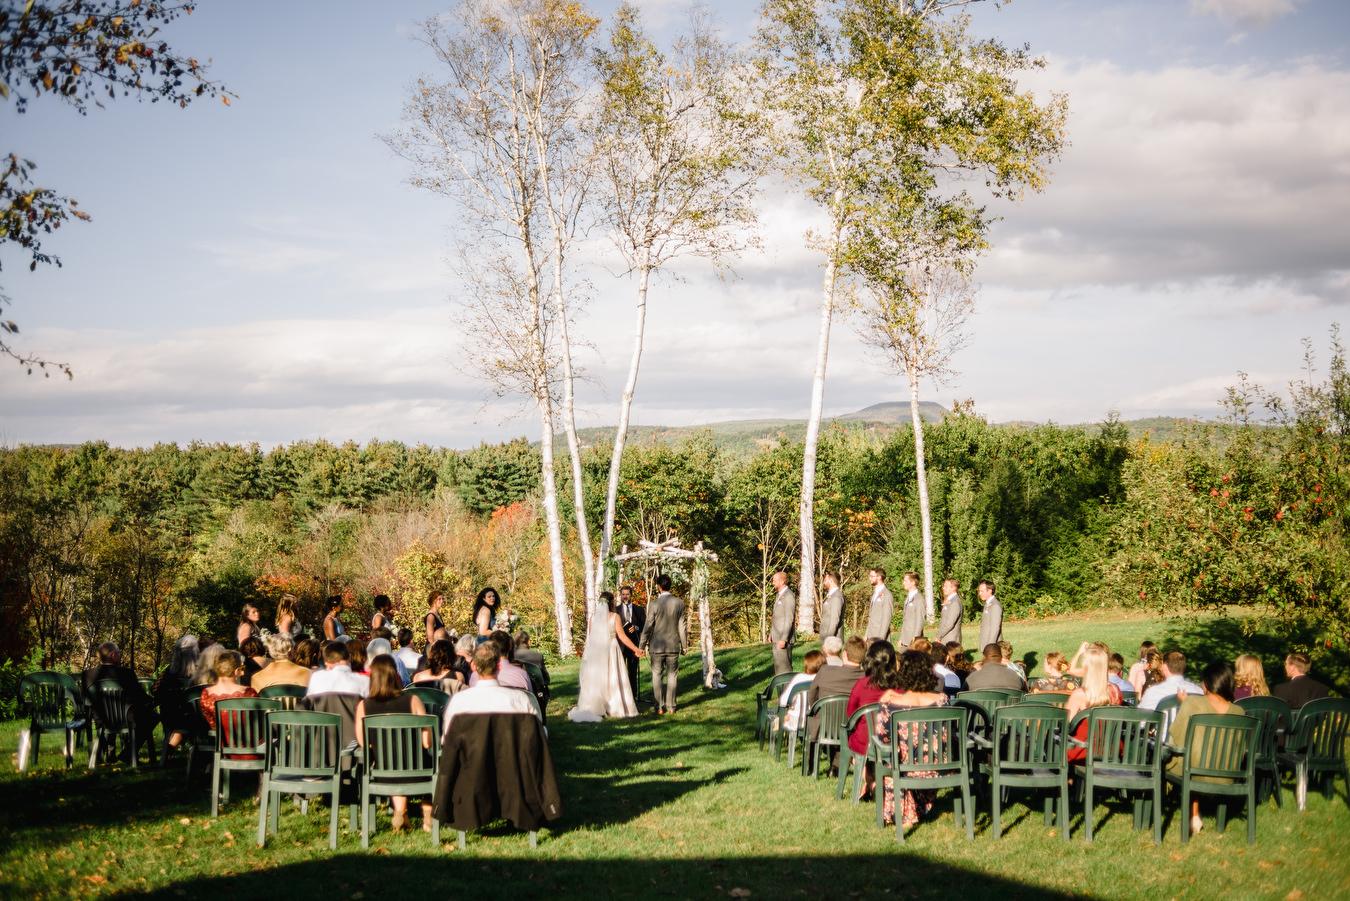 Sarah & Joel's Fun Wedding with Mountain Views at The Common